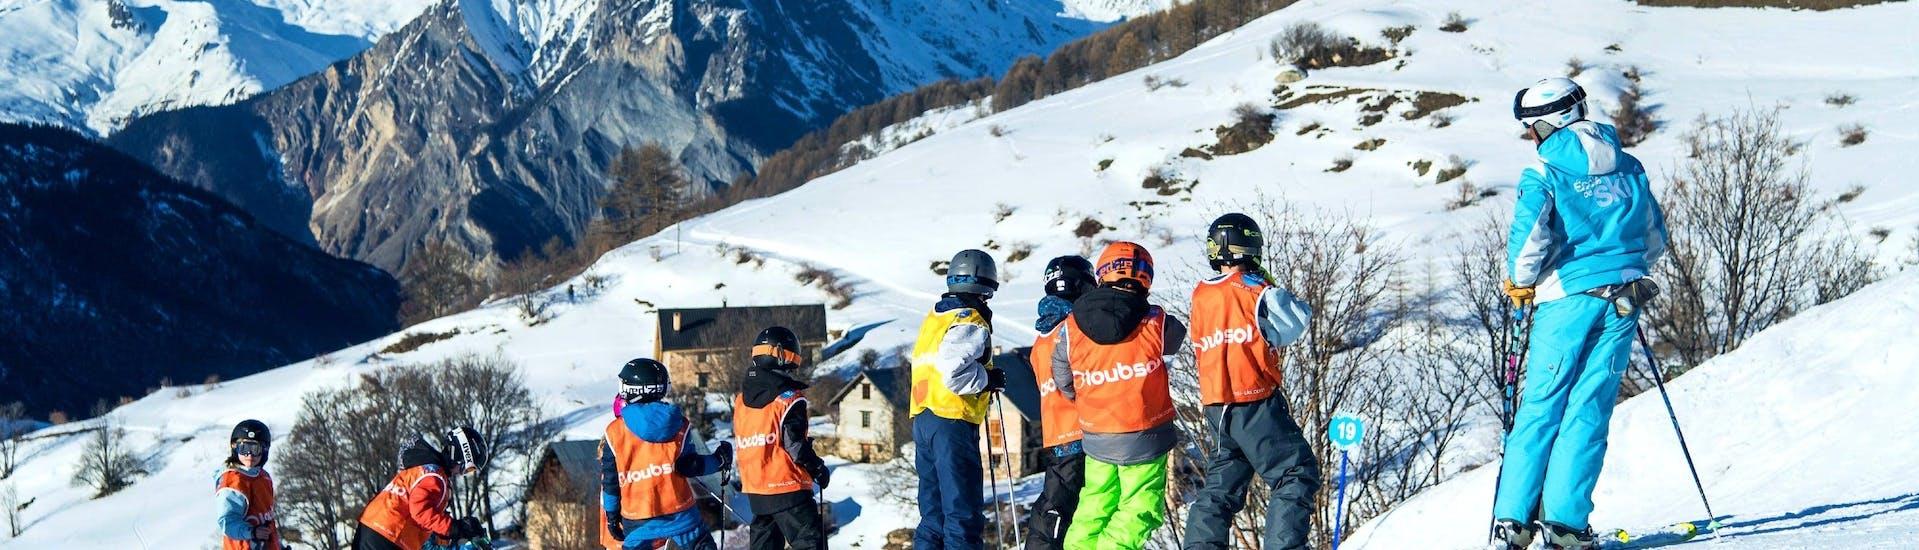 kids-ski-lessons-4-13-years-christmas-esi-les-orre-hero